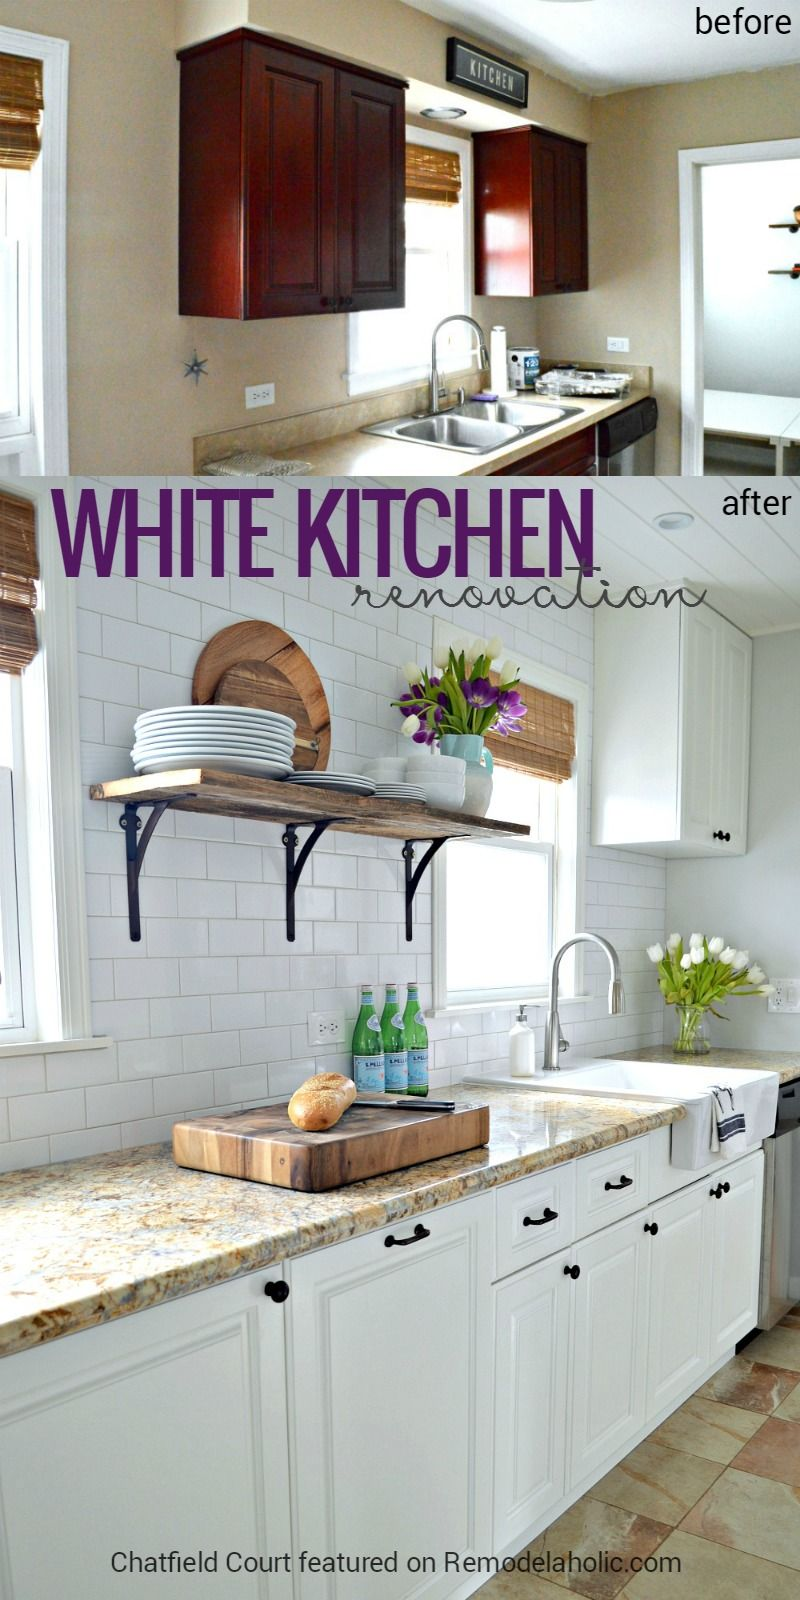 Beautiful white kitchen renovation to replace white cabinets and add ...